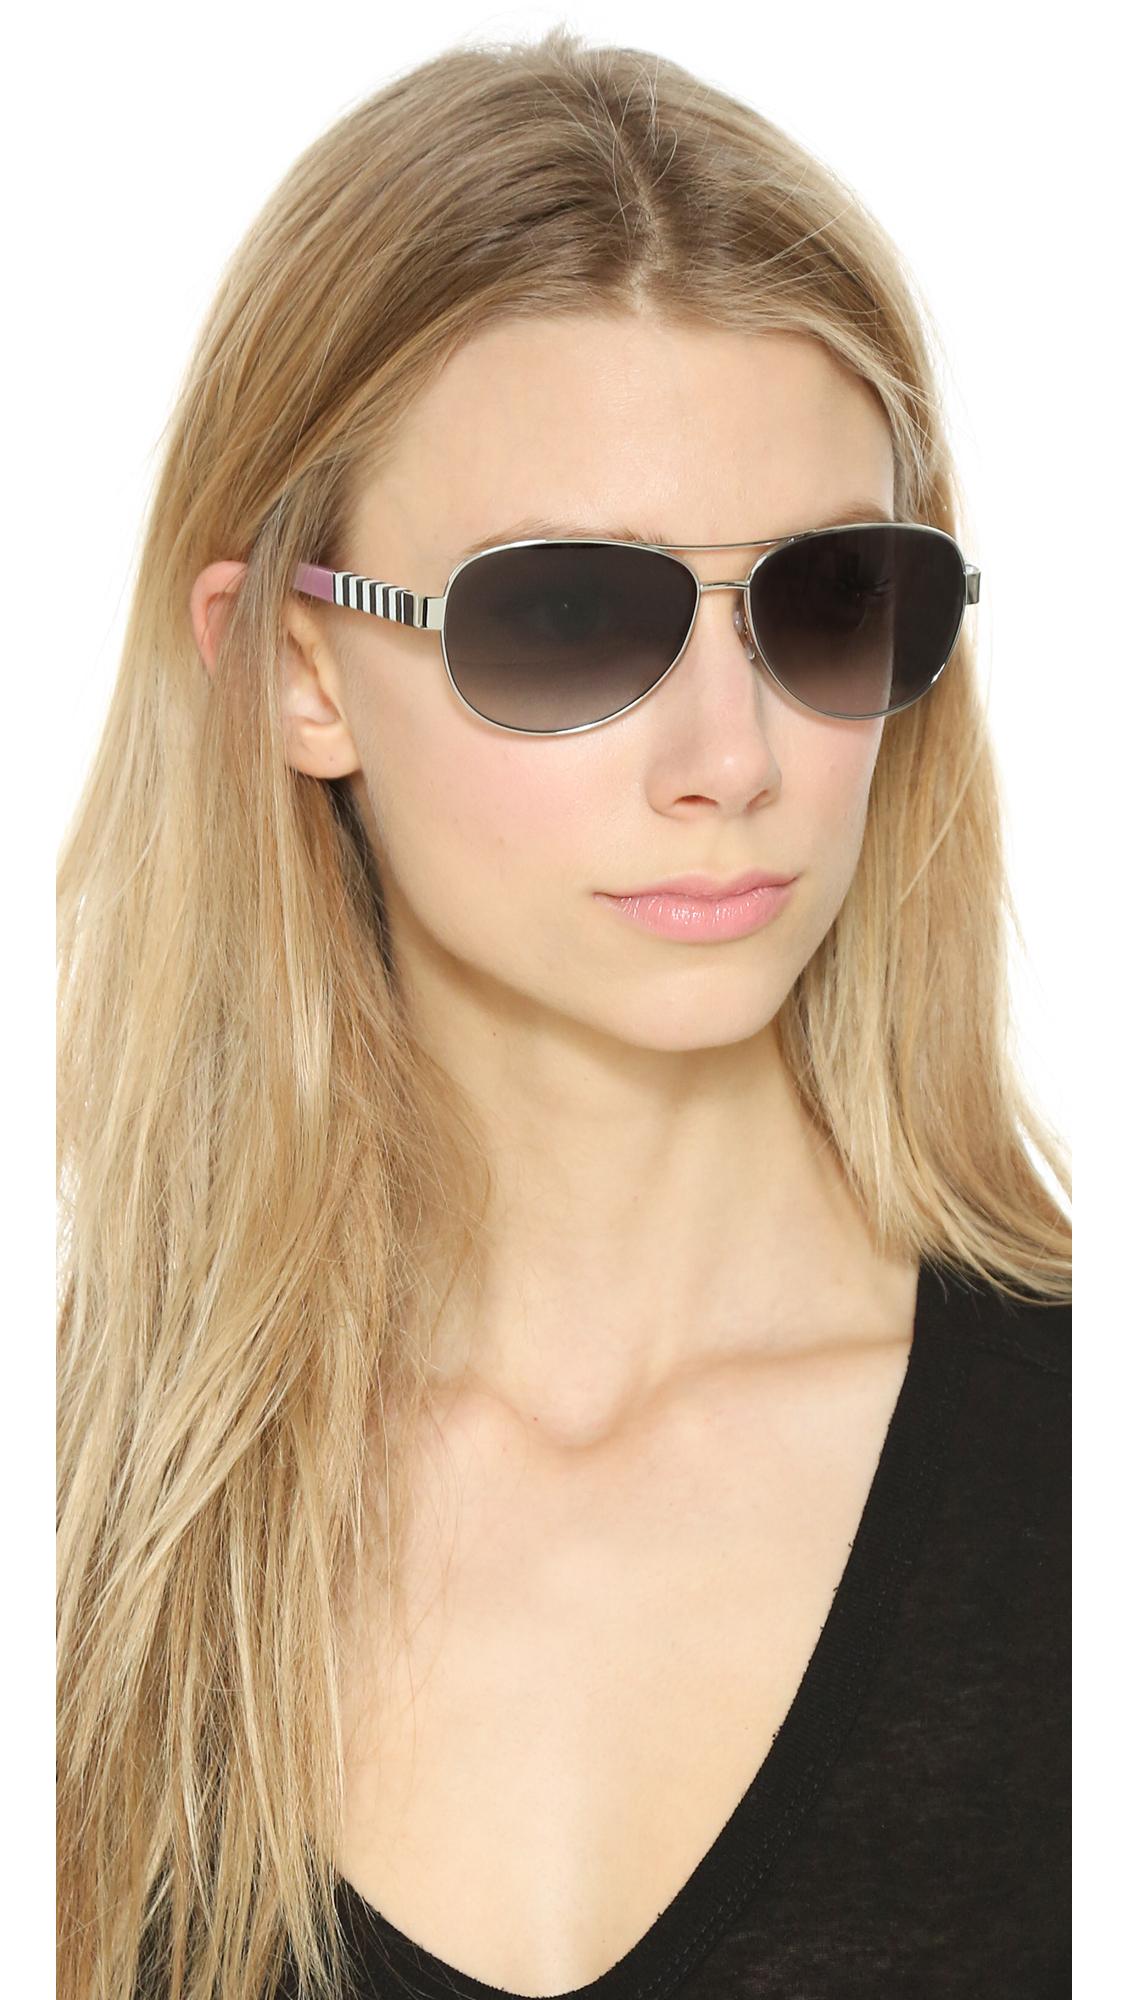 41995638c9b2 Kate Spade Dalia Sunglasses - Silver/grey Gradient in Metallic - Lyst